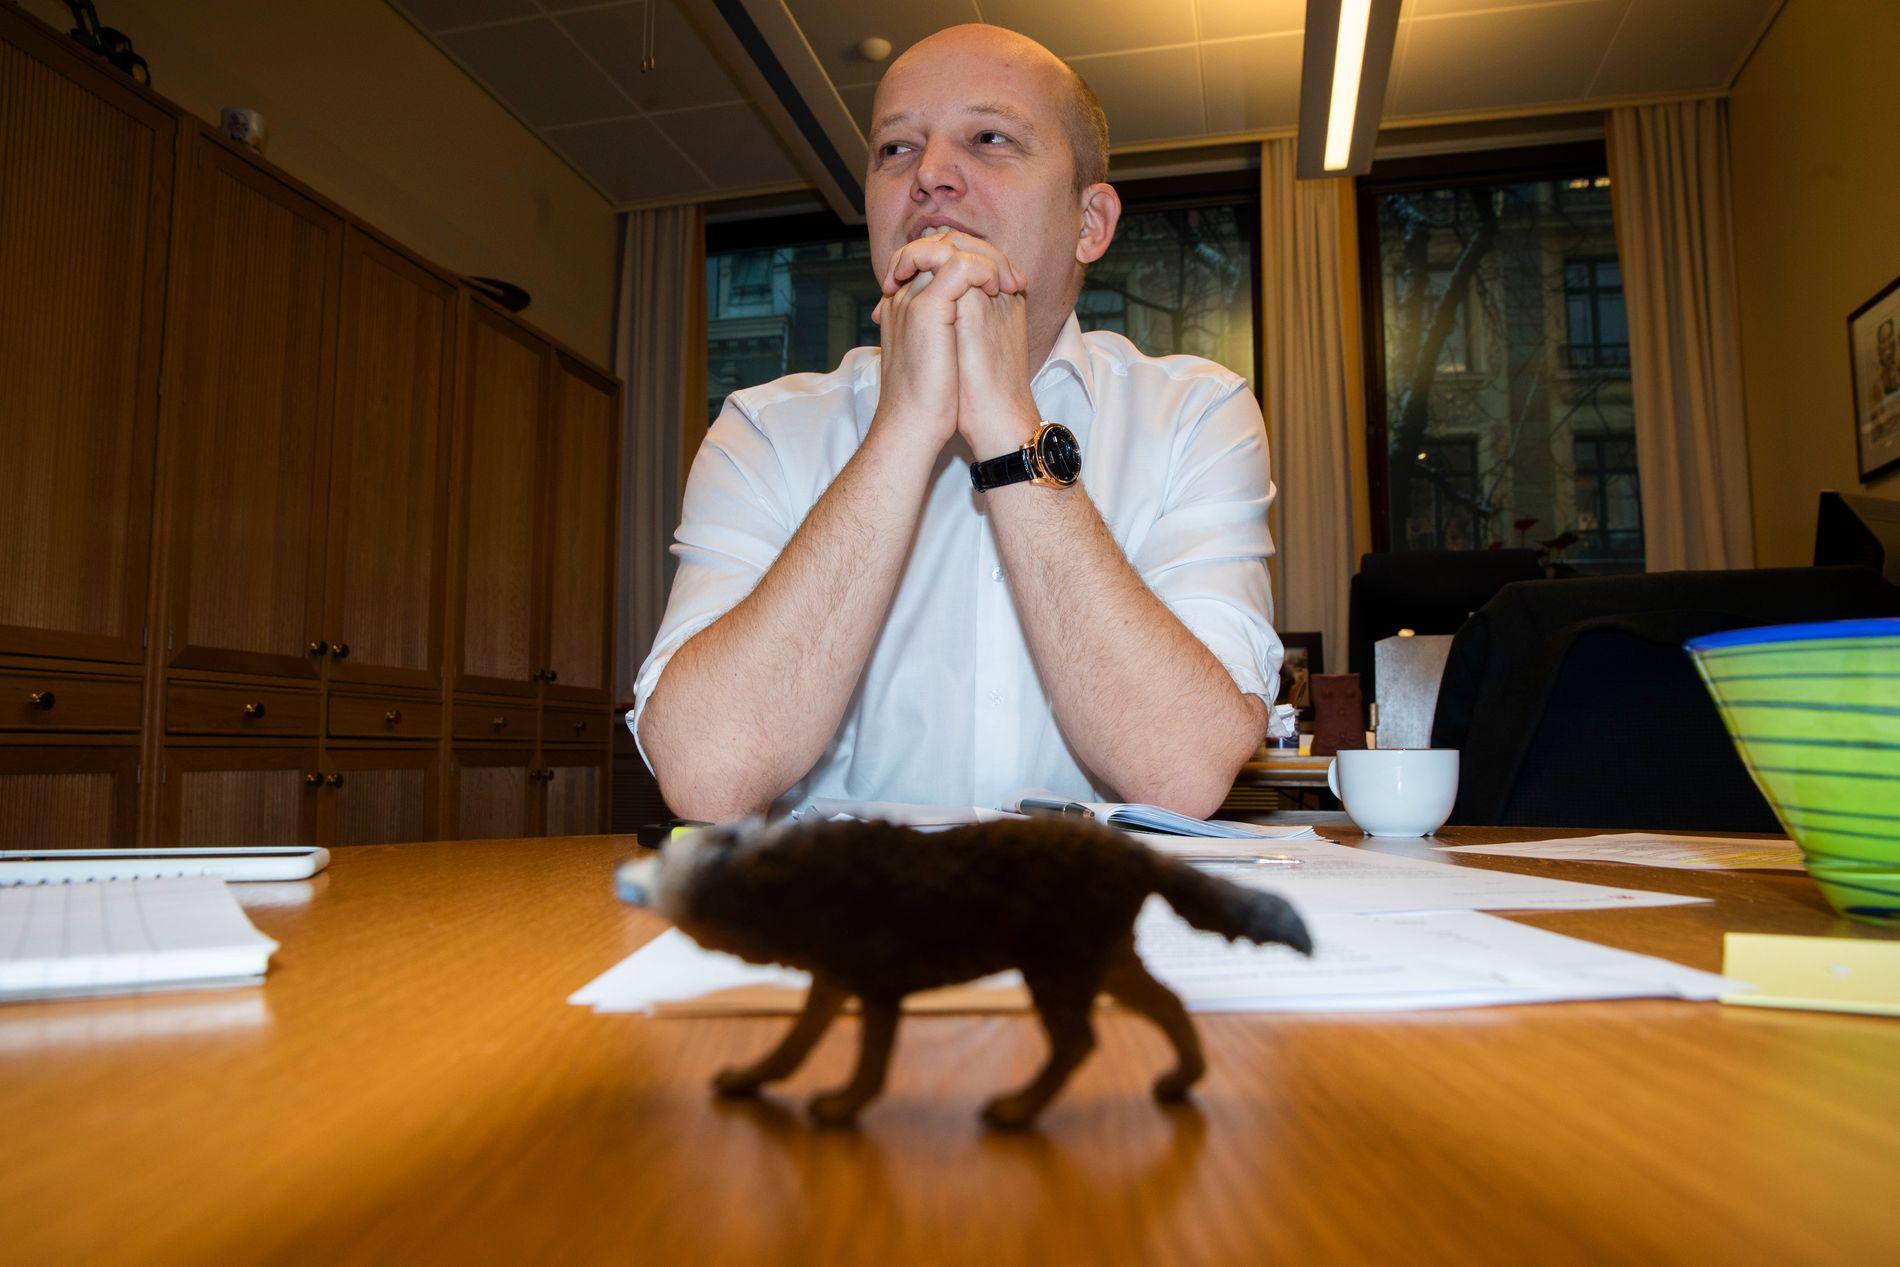 ULVE-MANNEN: Sp-leder Trygve Slagsvold Vedum vil fokusere på ulv helt frem til lokalvalget i september i år.